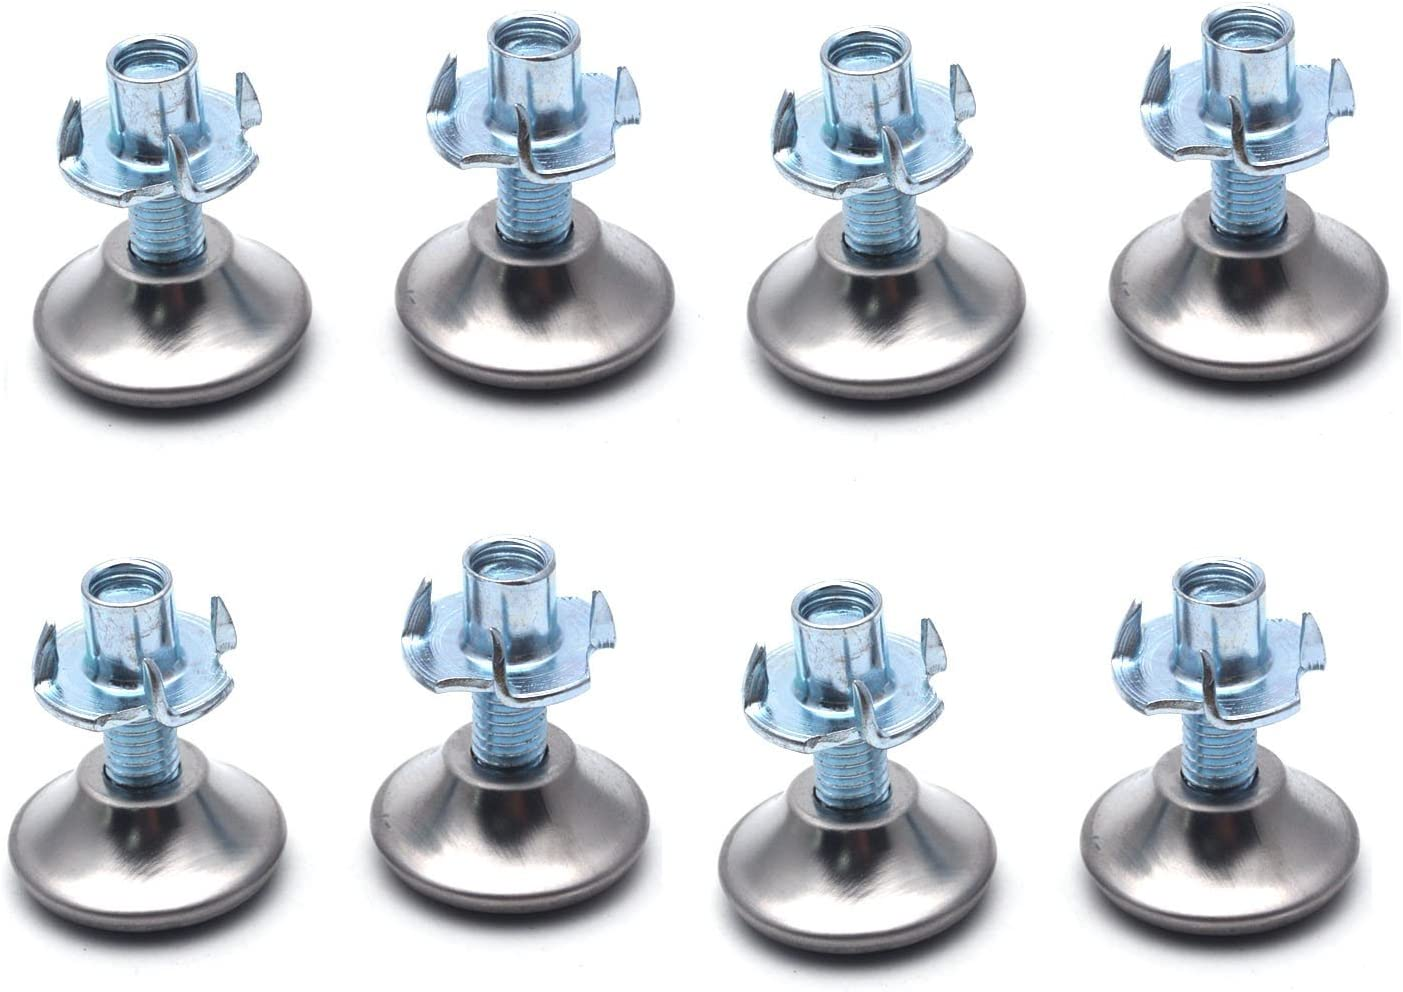 Antrader 8mm Furniture Leg Levelers Table Leveling Feet Adjustable Furniture Foot with T-nut Set of 8